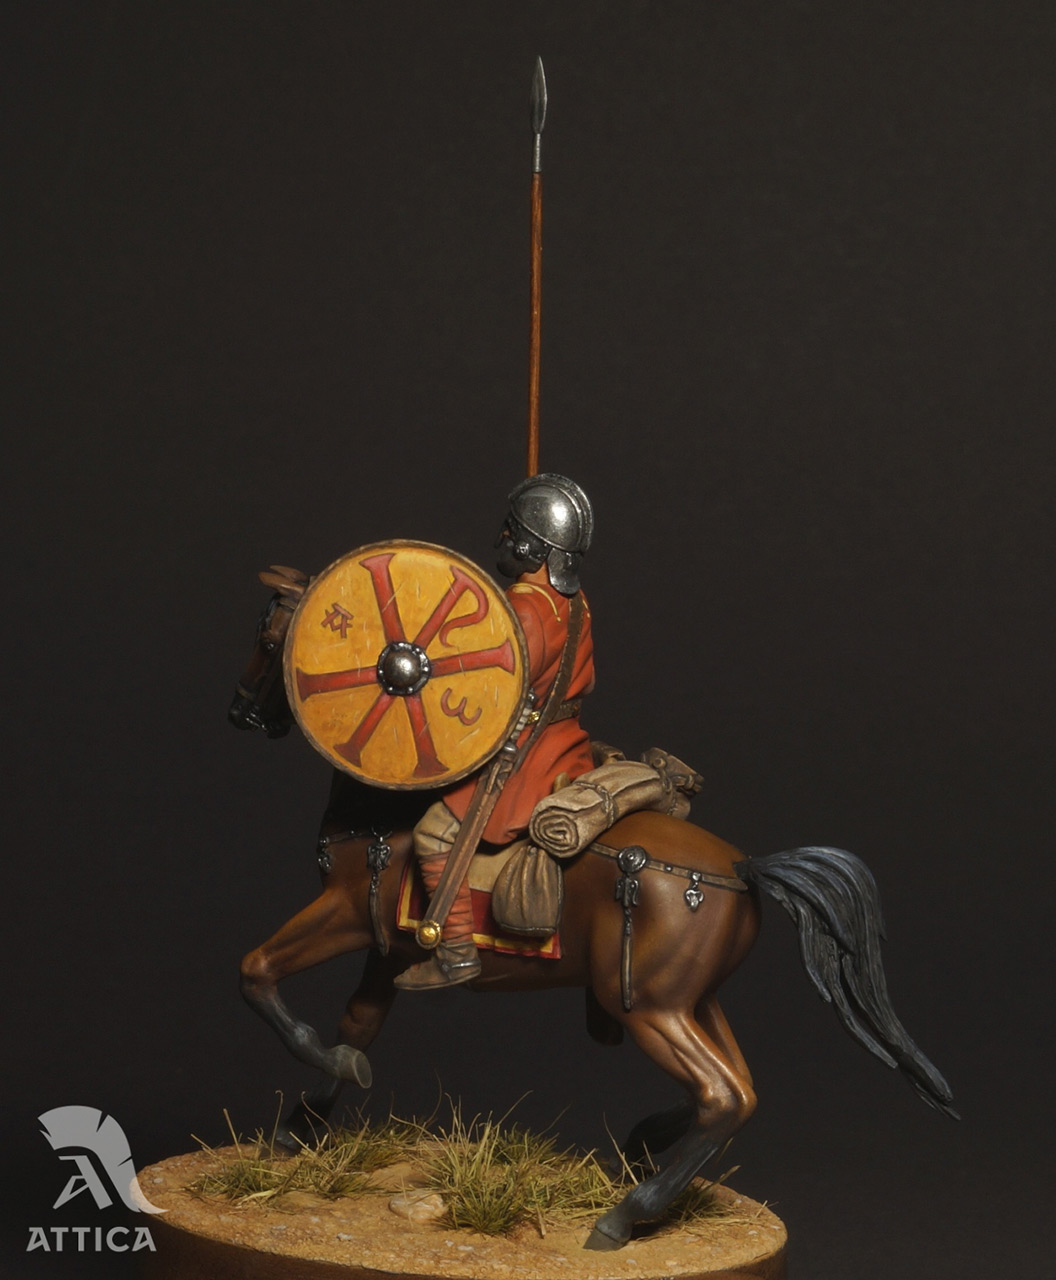 Фигурки: Римский всадник  4 в.н.э., фото #9